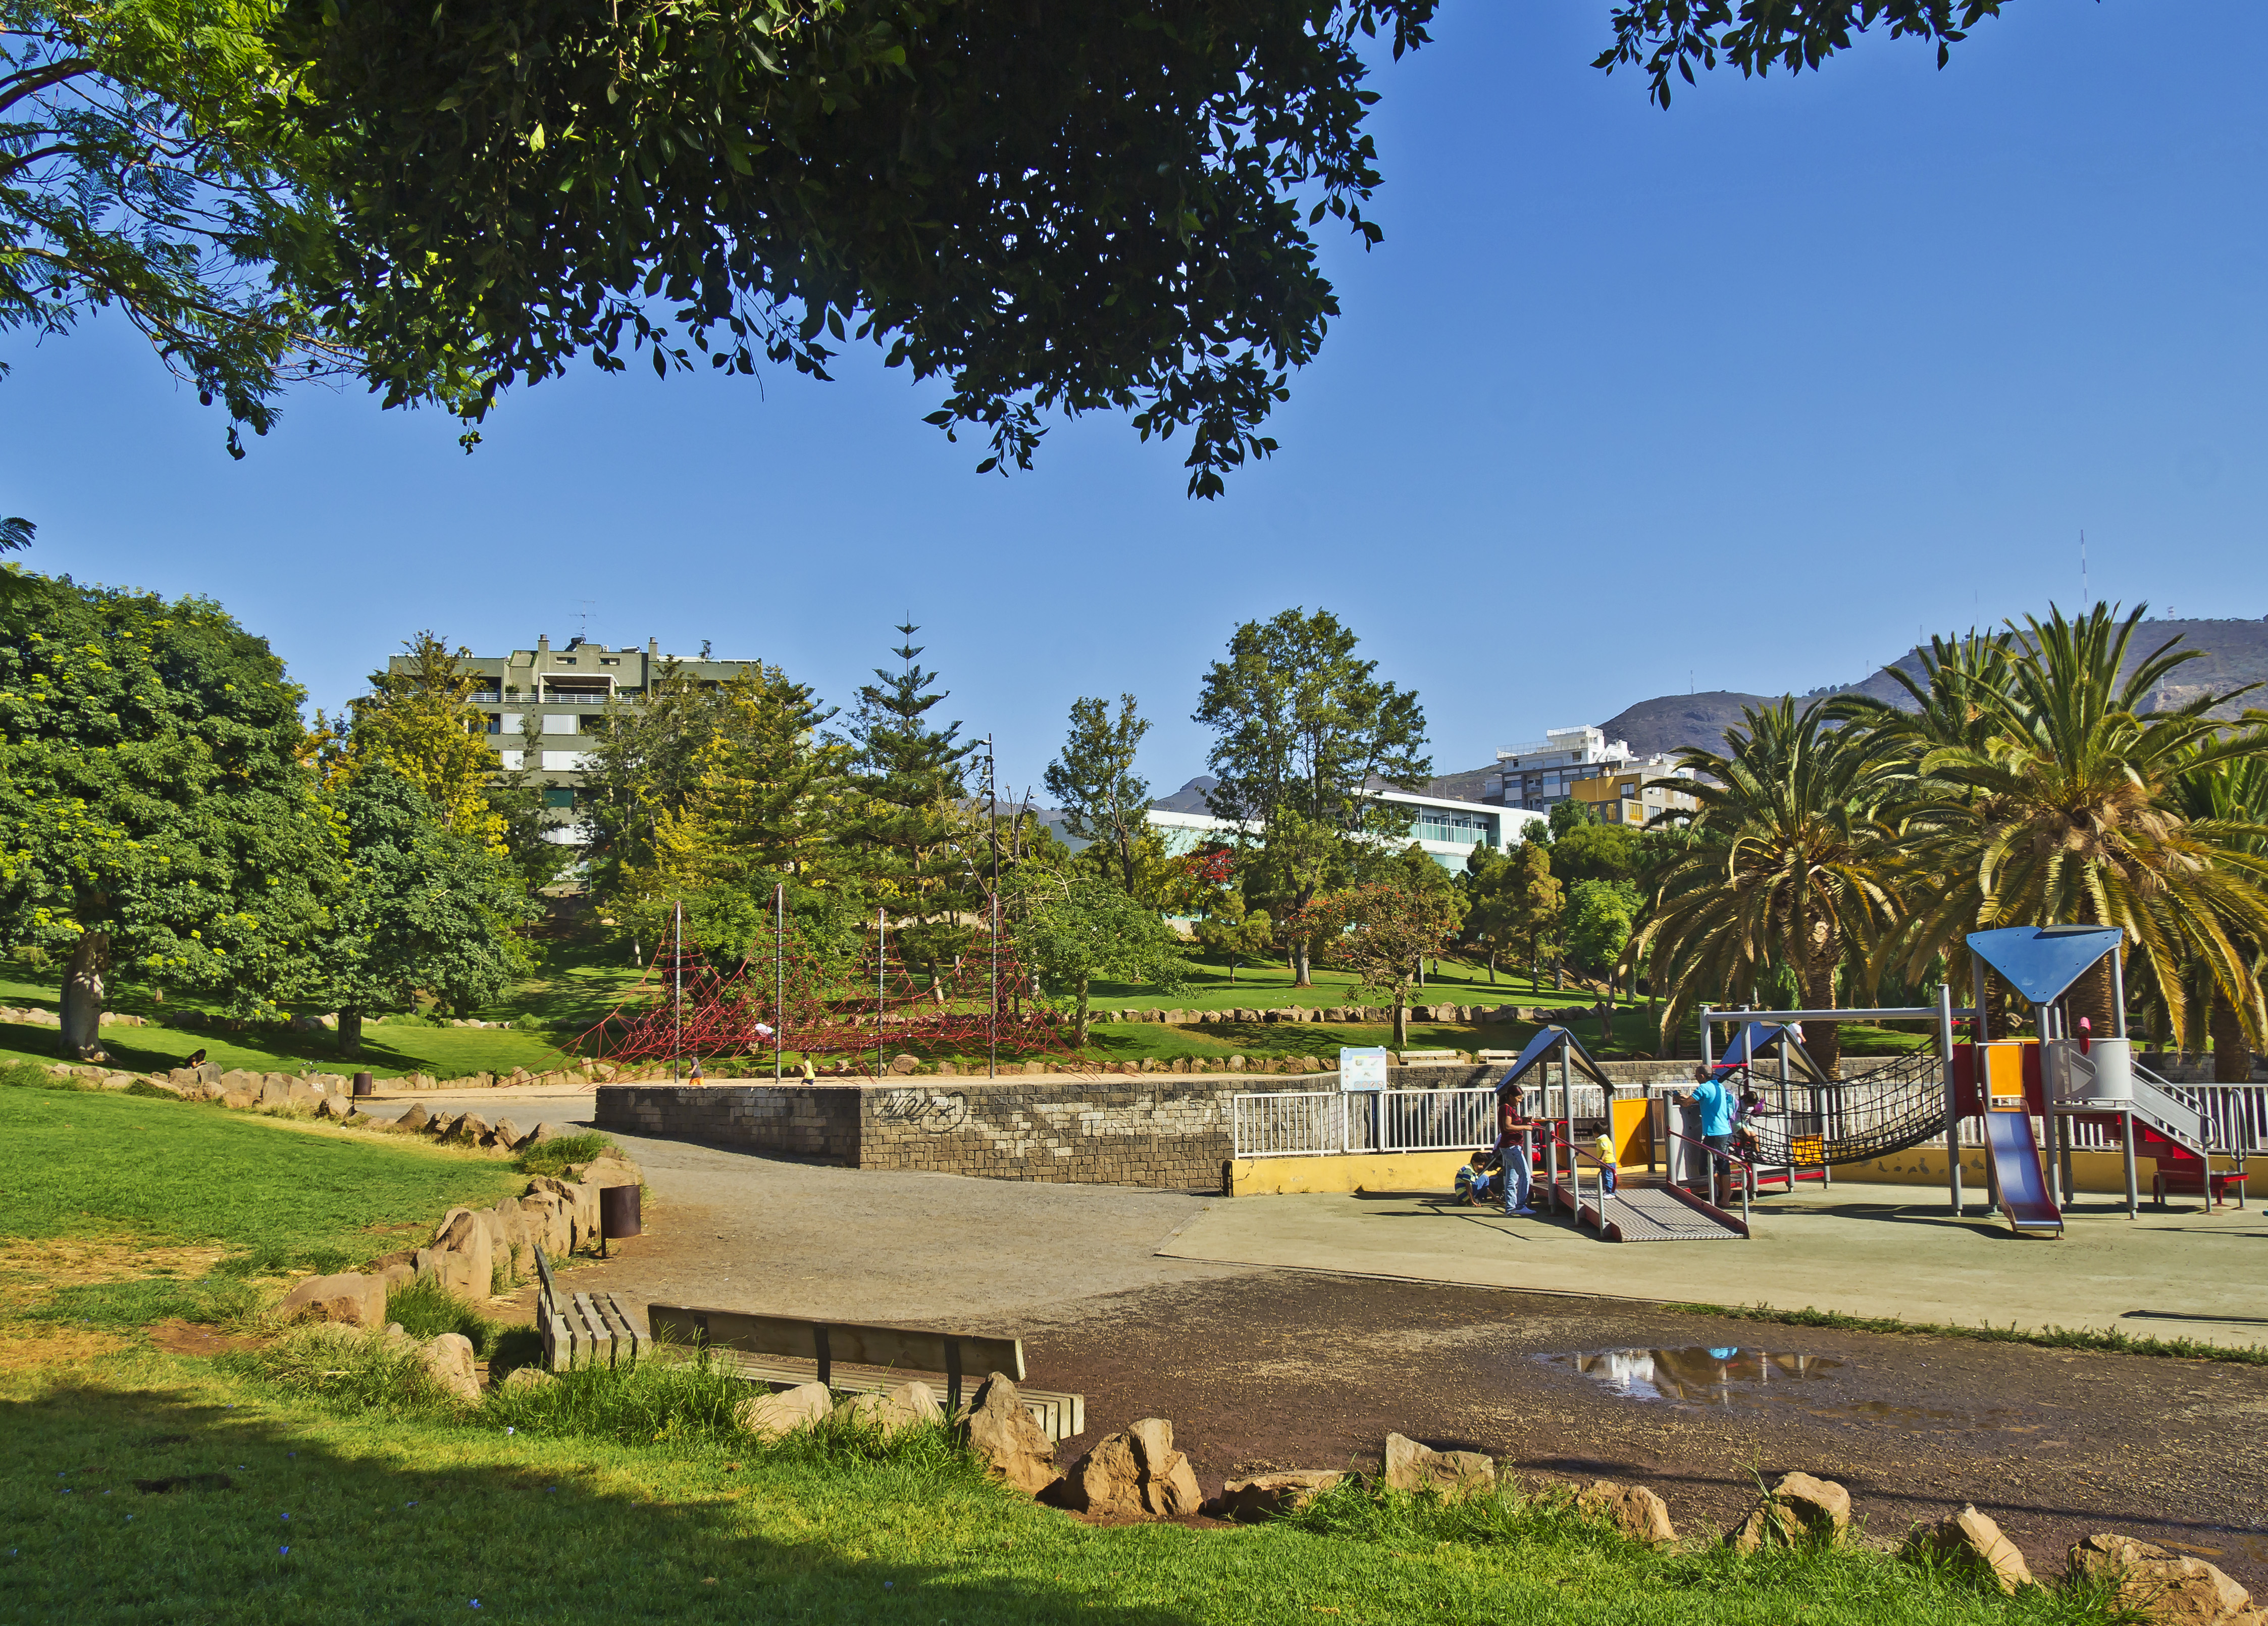 File parque la granja wikimedia commons - Parques infantiles en santa cruz de tenerife ...